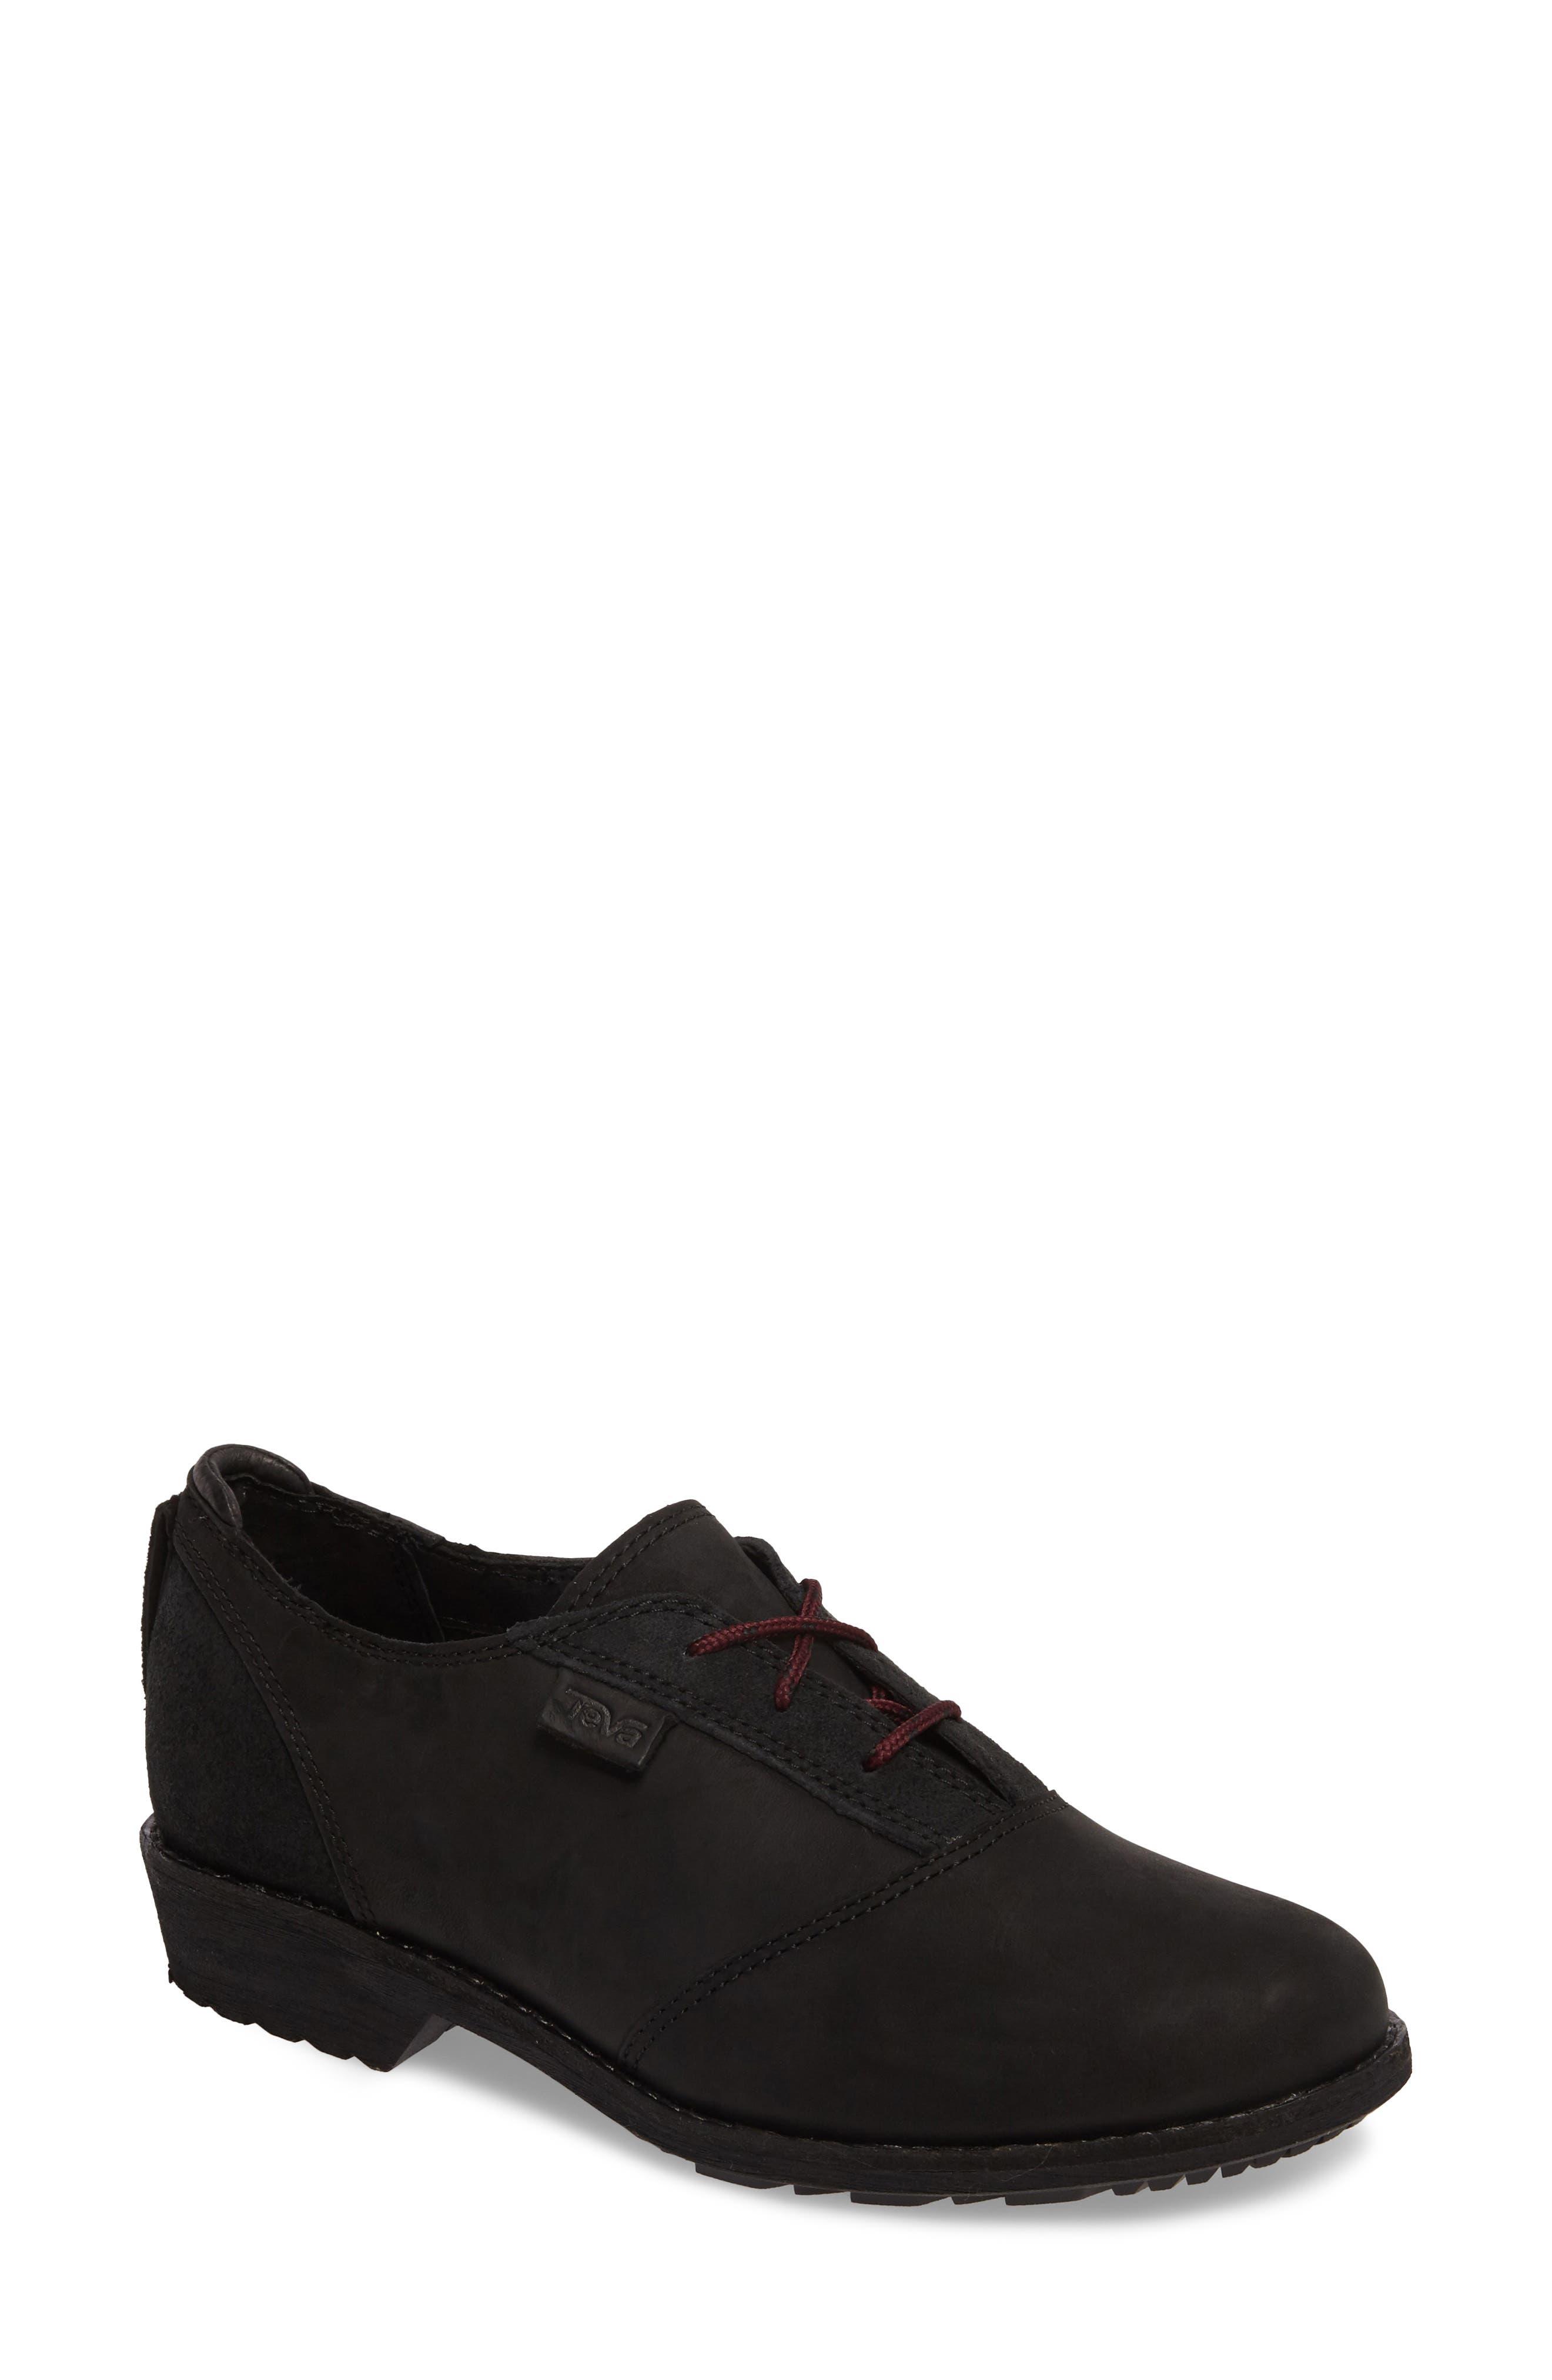 Alternate Image 1 Selected - Teva De La Vina Dos Waterproof Sneaker (Women)